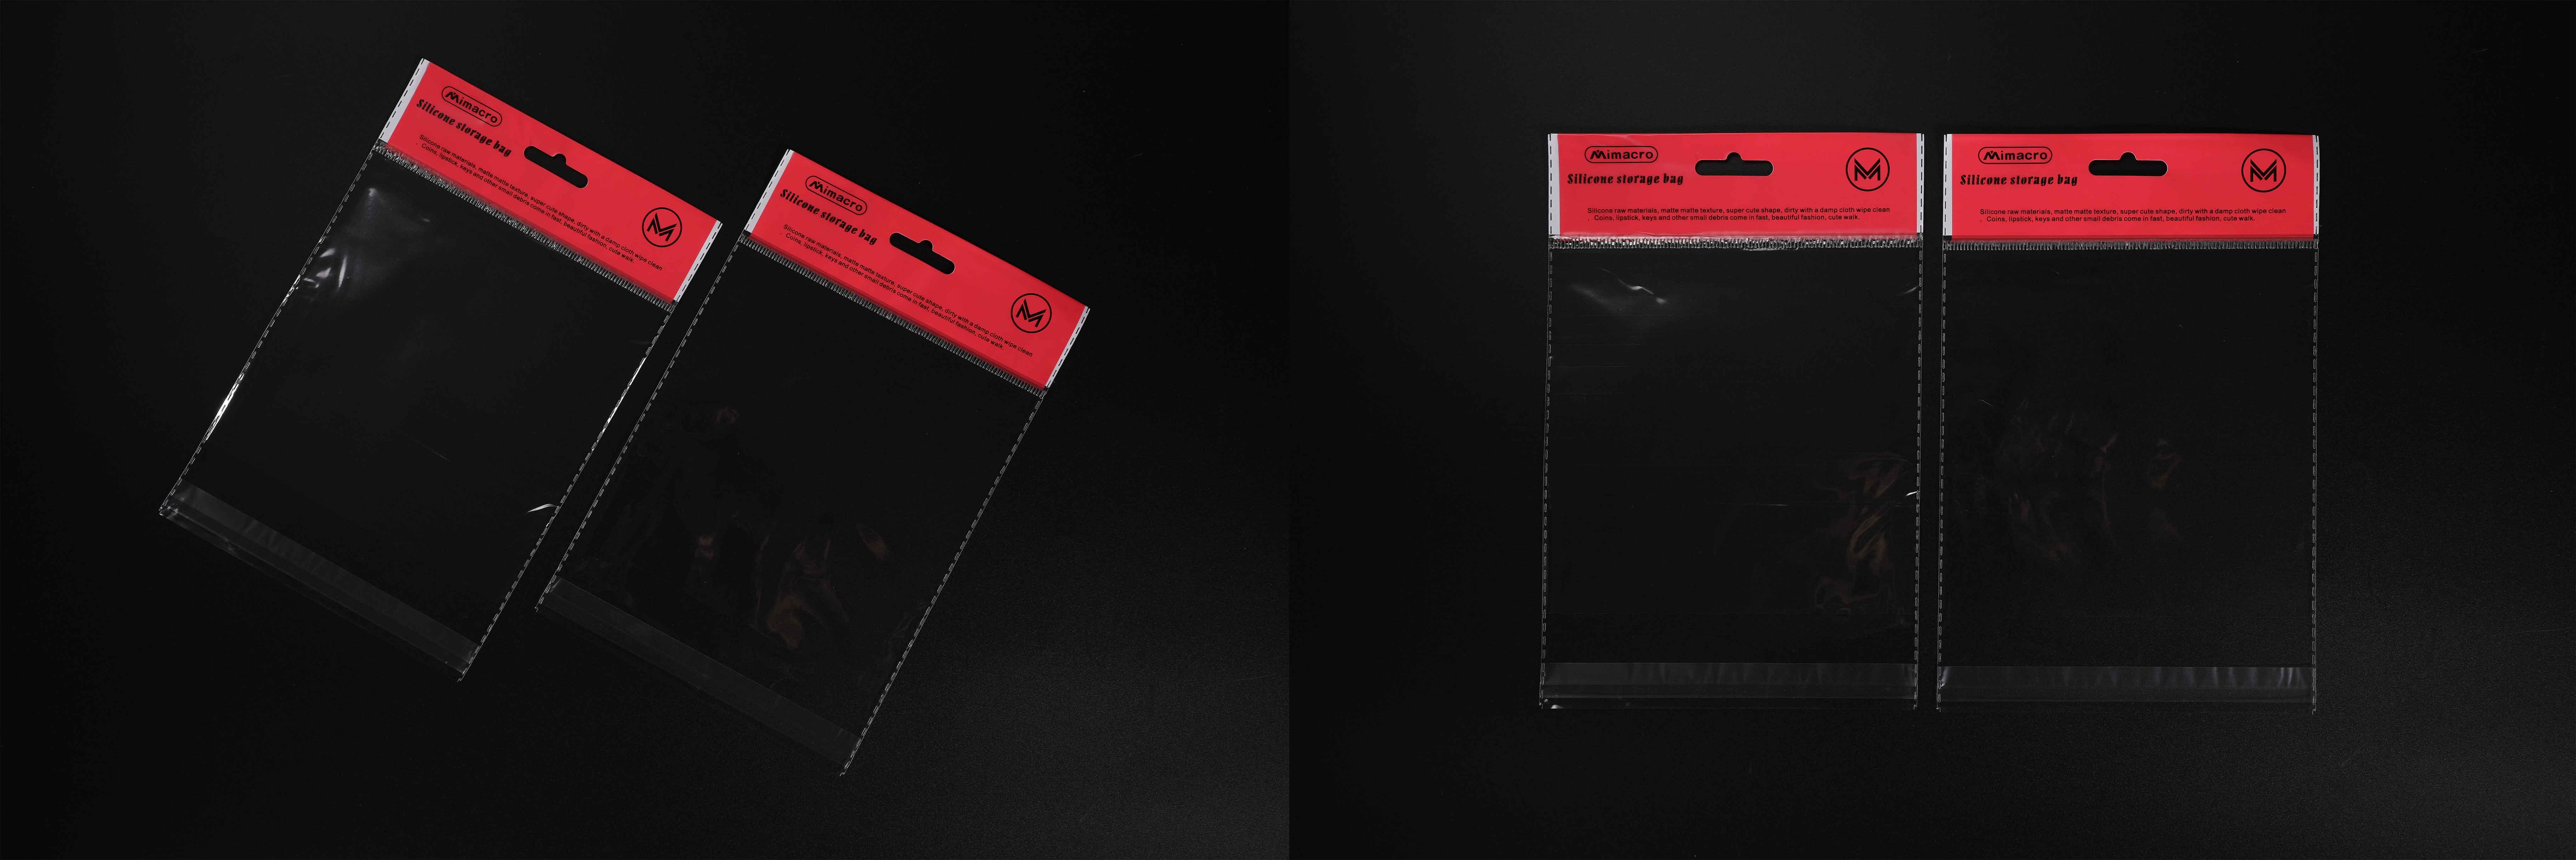 opp袋——六顺鑫产品